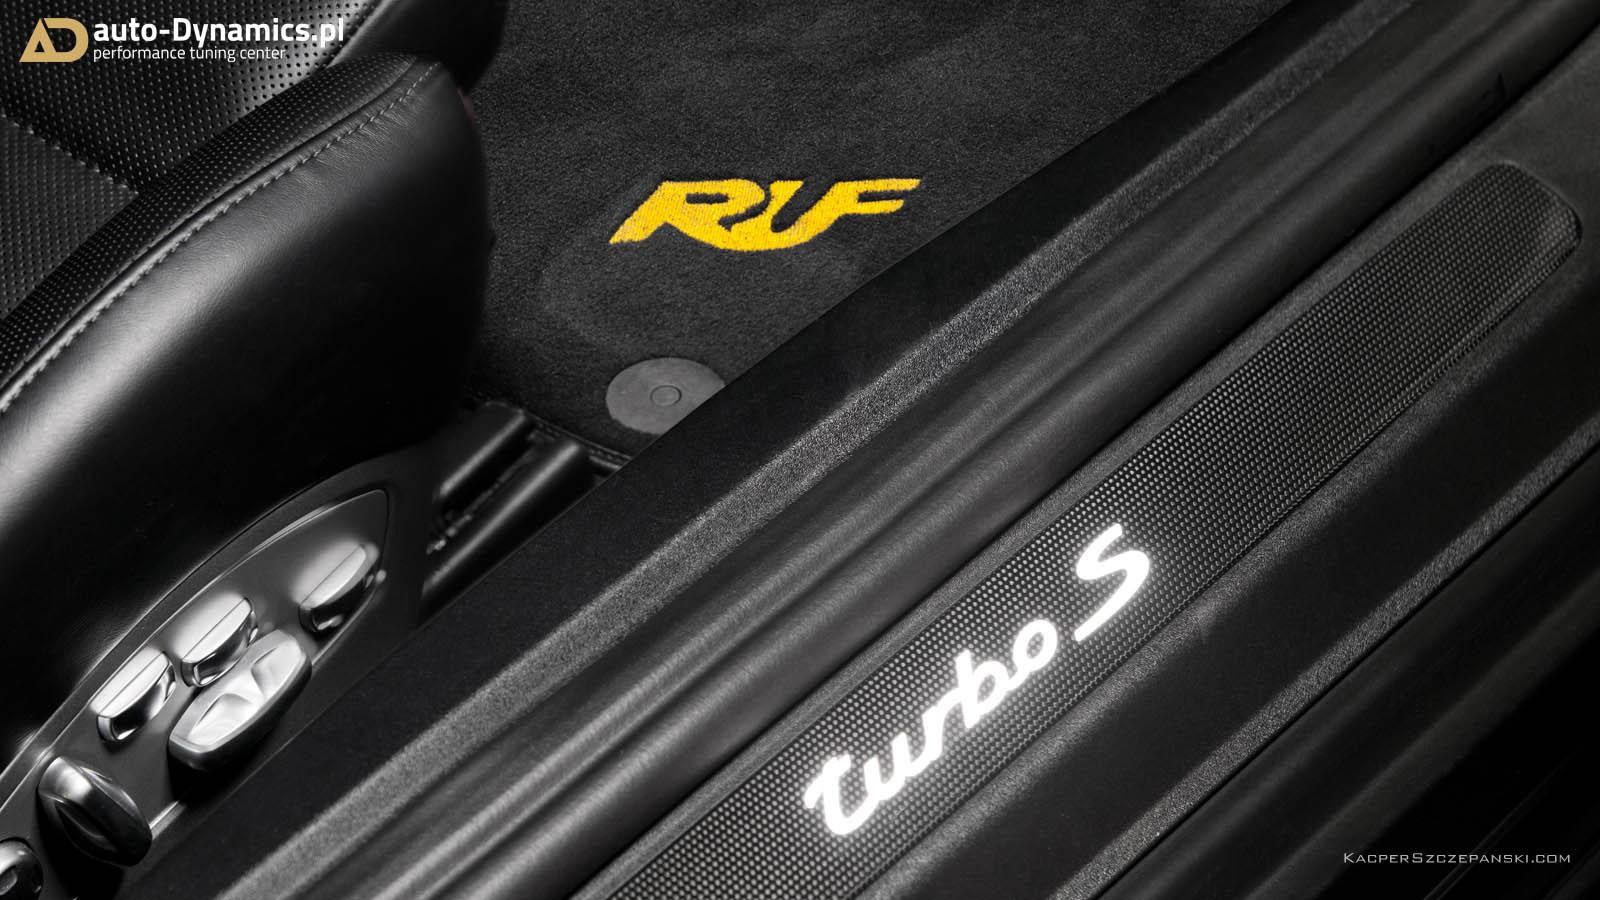 Porsche 911 Turbo S by Auto-Dynamics (14)